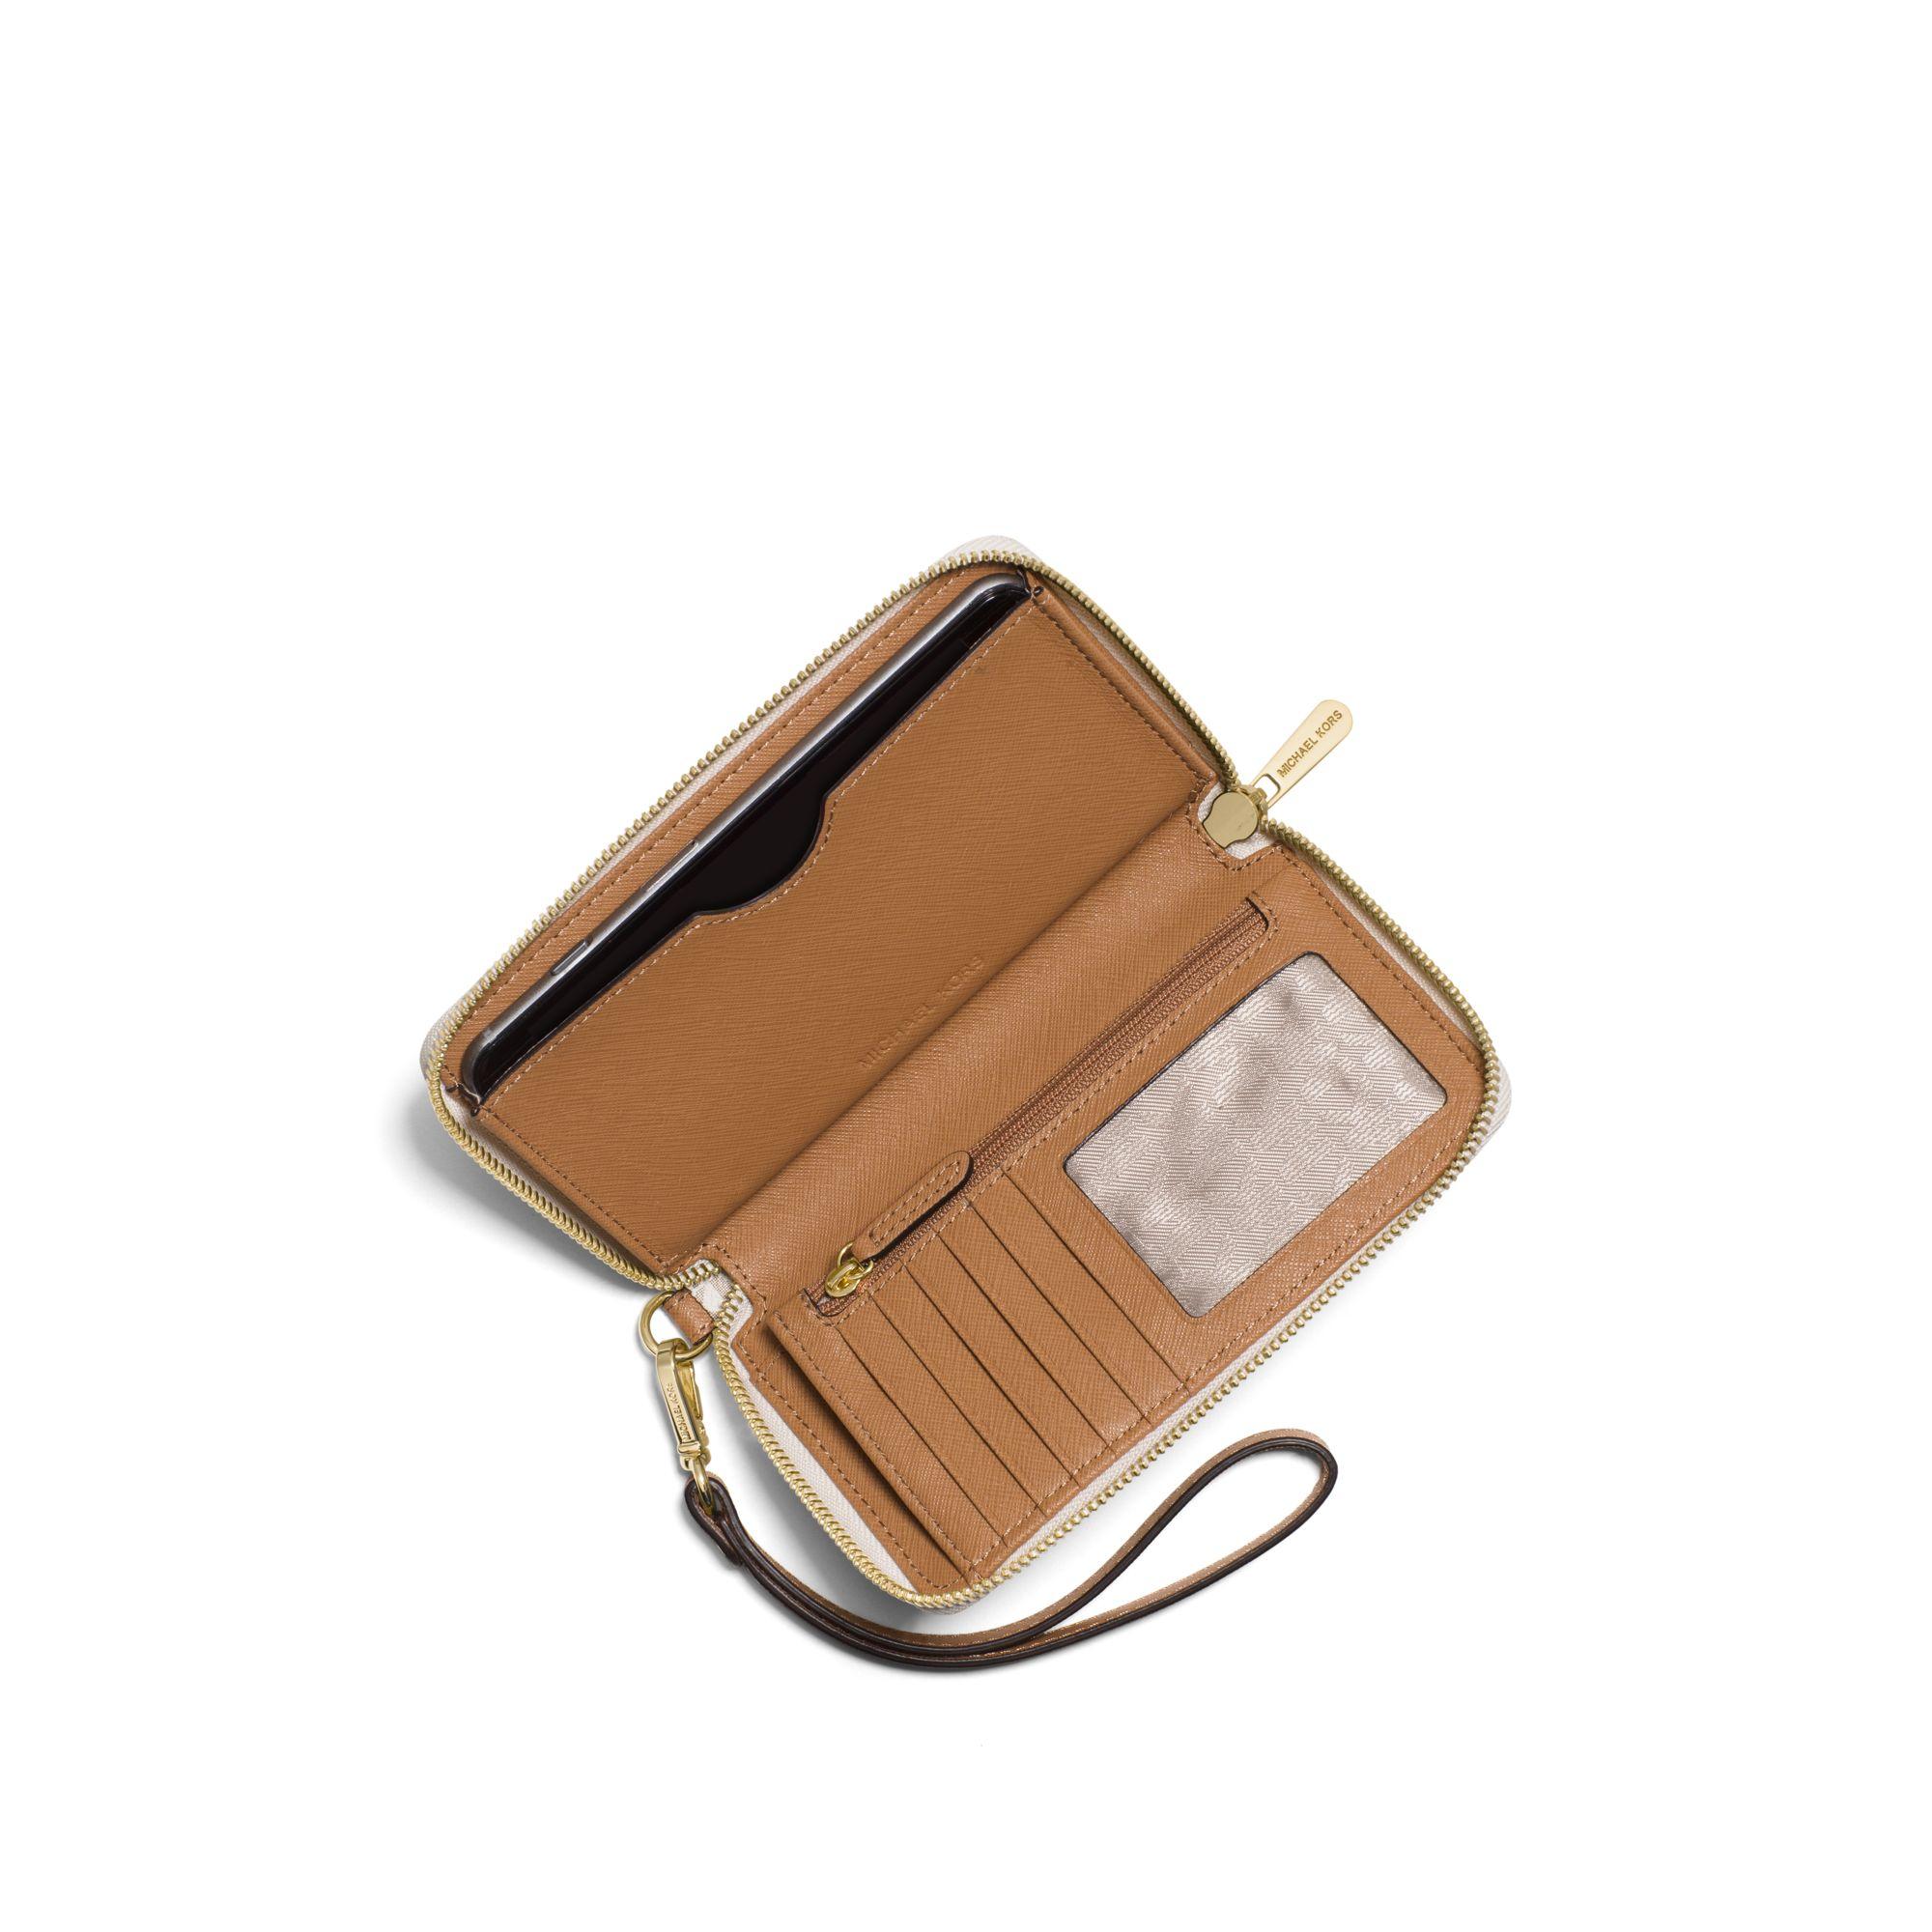 614e7f6da25308 Michael Kors Travel Smartphone Wristlet in White - Lyst